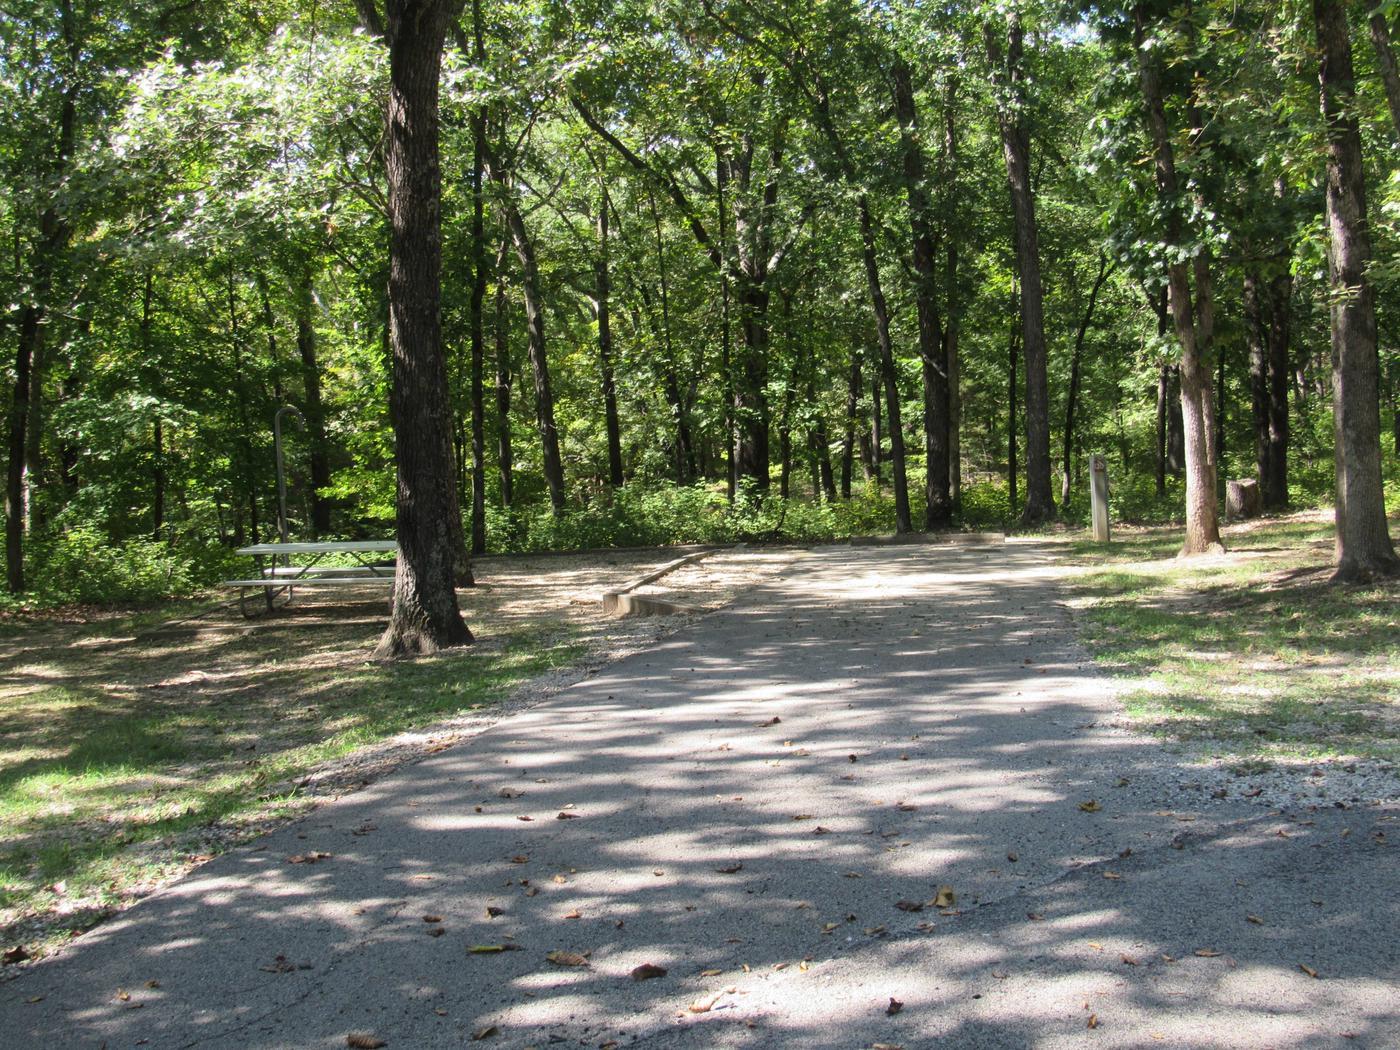 Indian Creek Site # 130